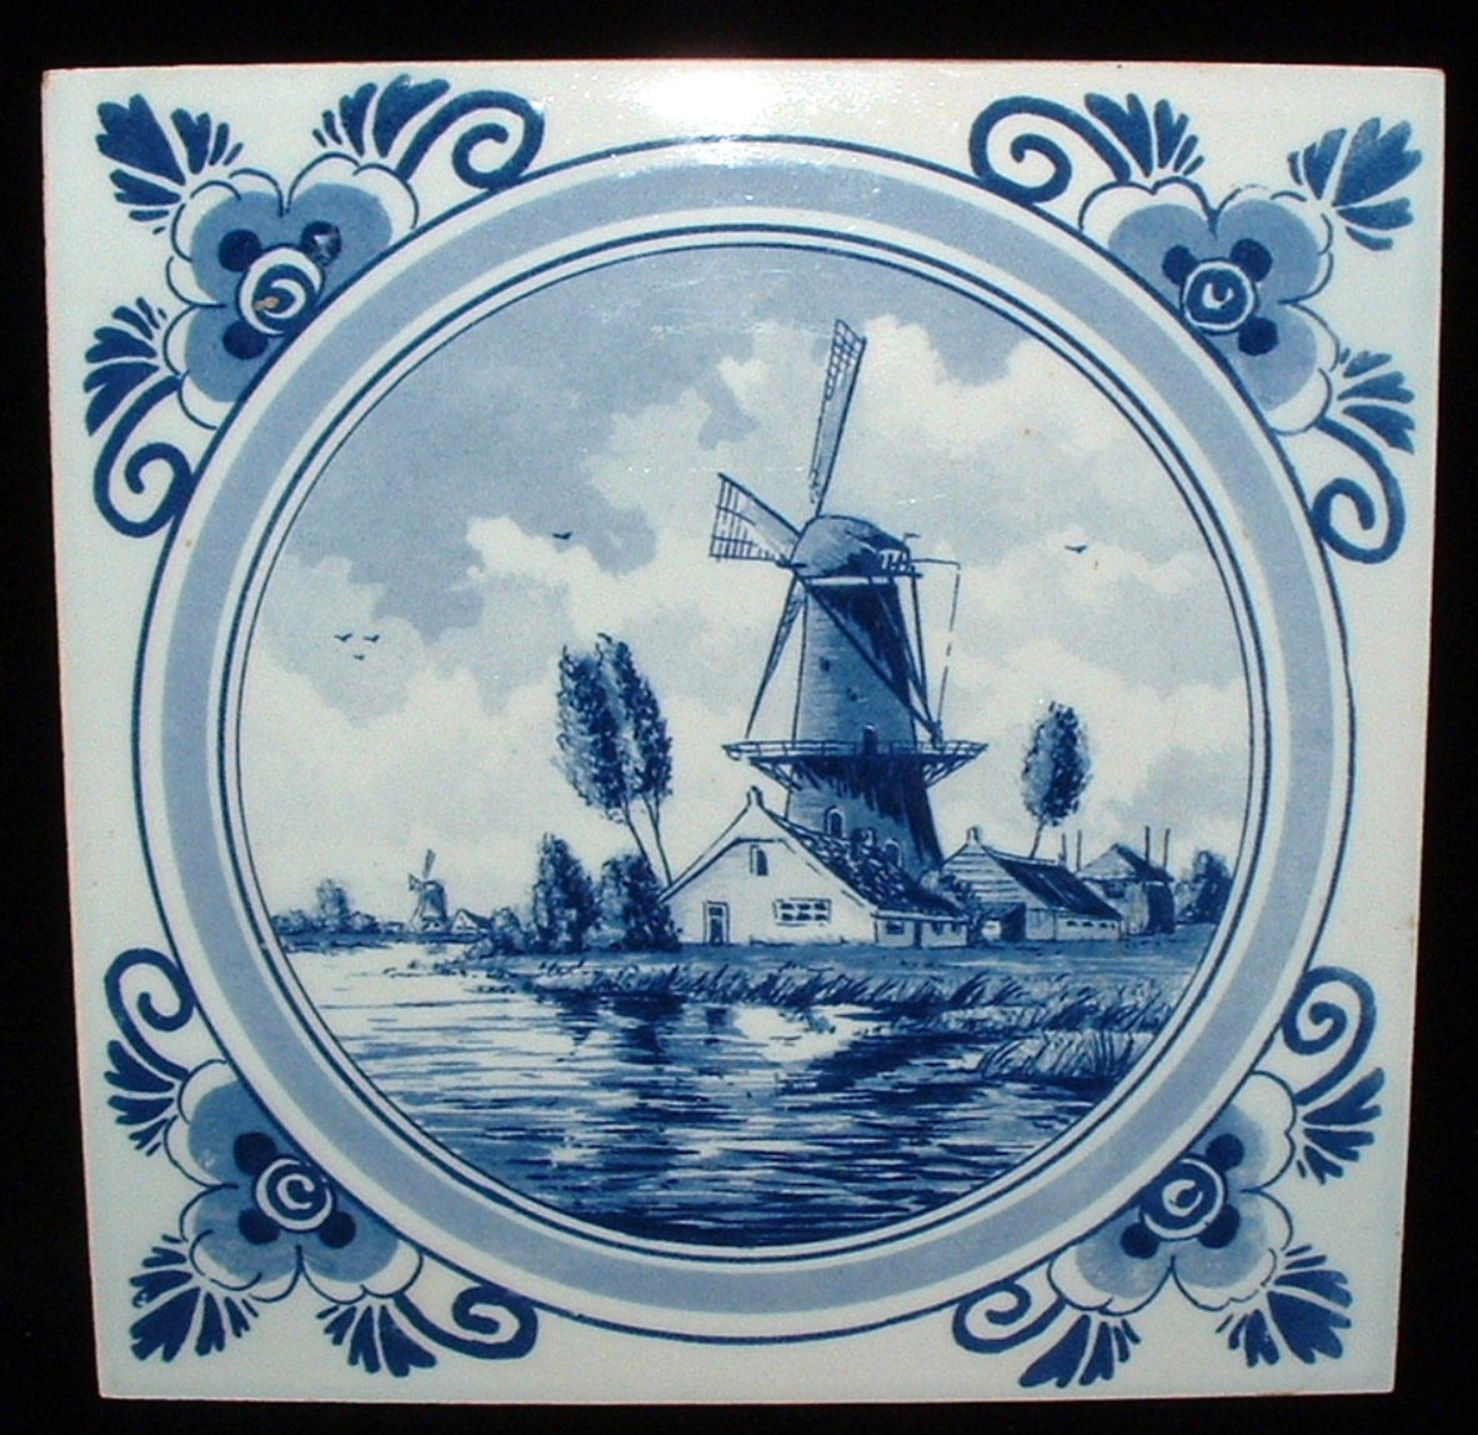 Delft Tile Delfts Windmill Canal Holland Vintage Dutch